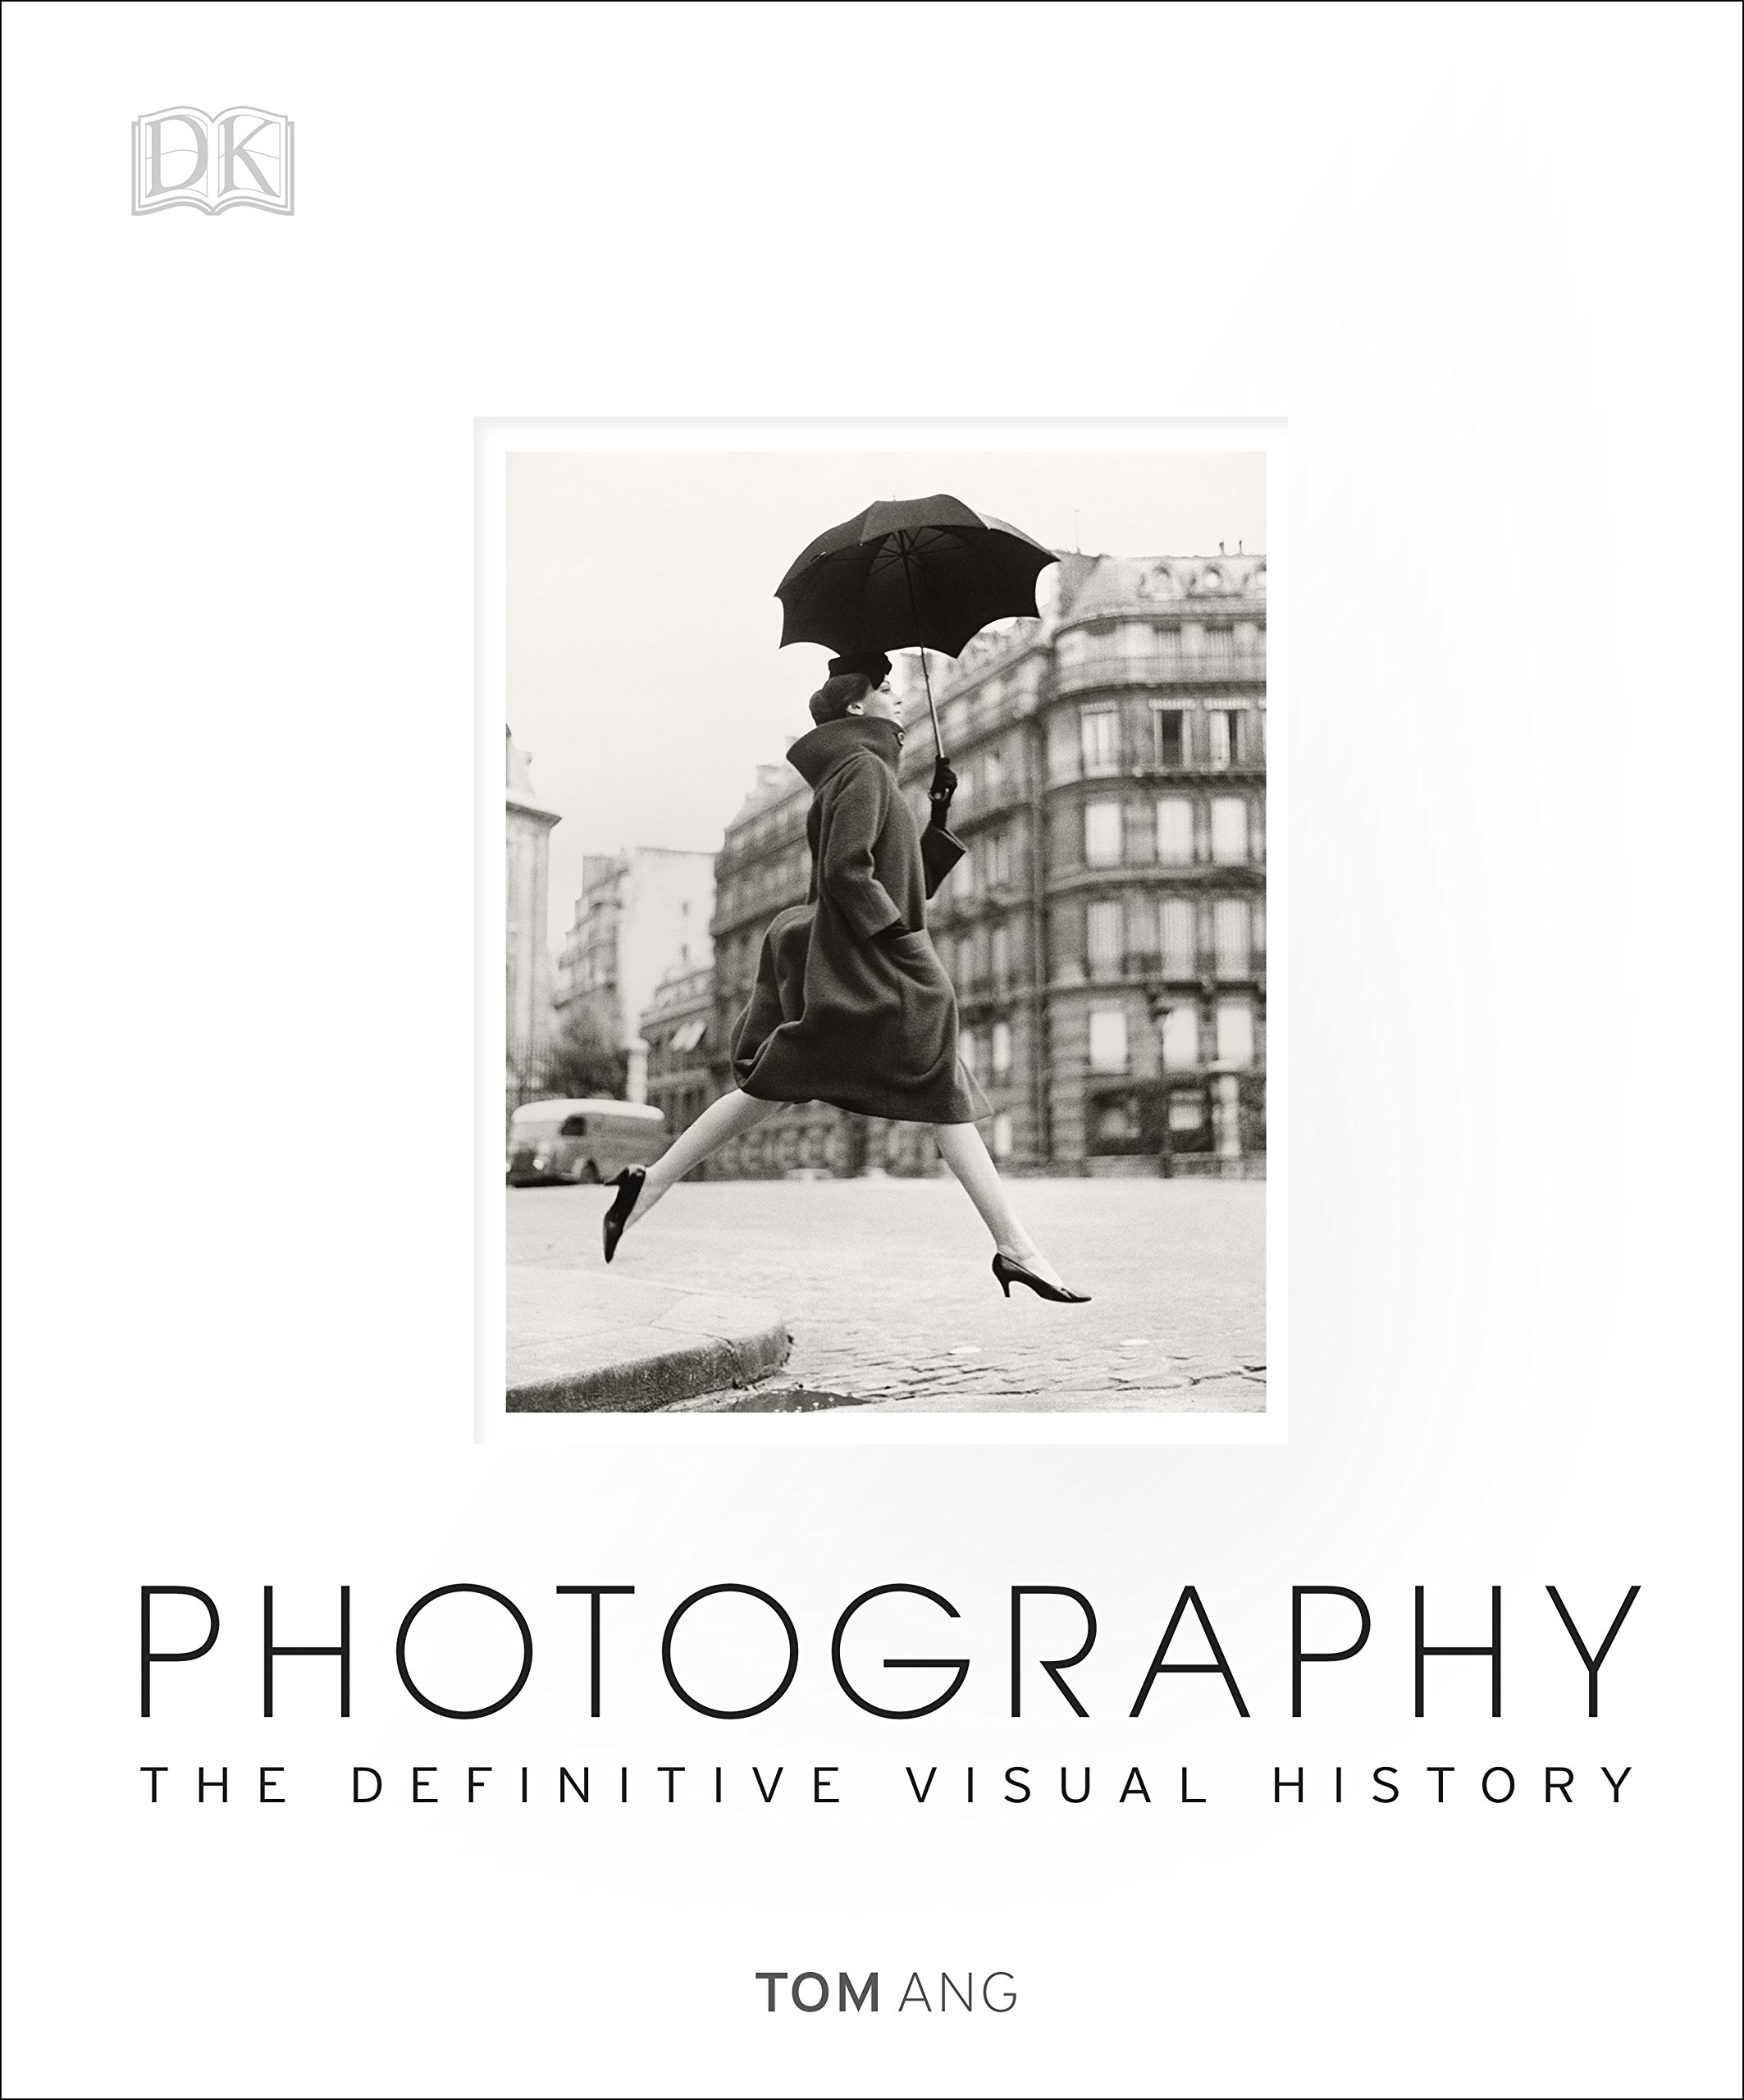 graphy The Definitive Visual History Tom Ang